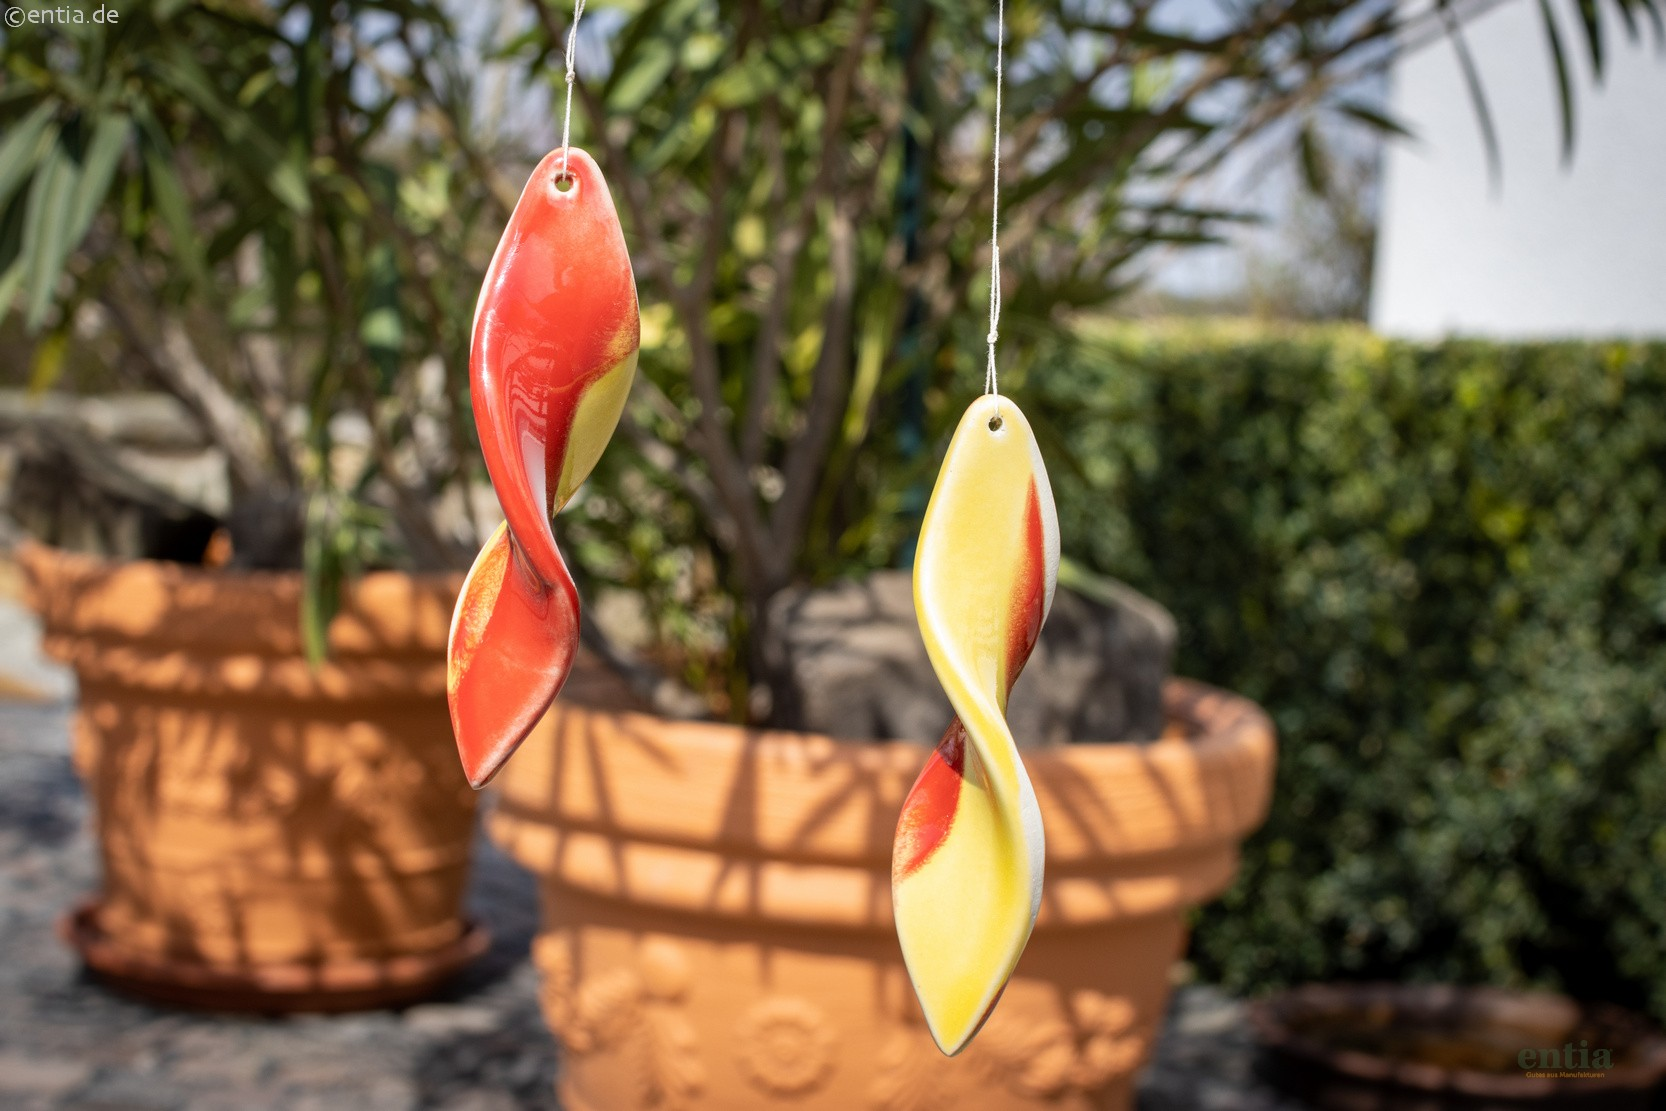 Windspiralen 2er-Set aus Keramik, rot/gelb